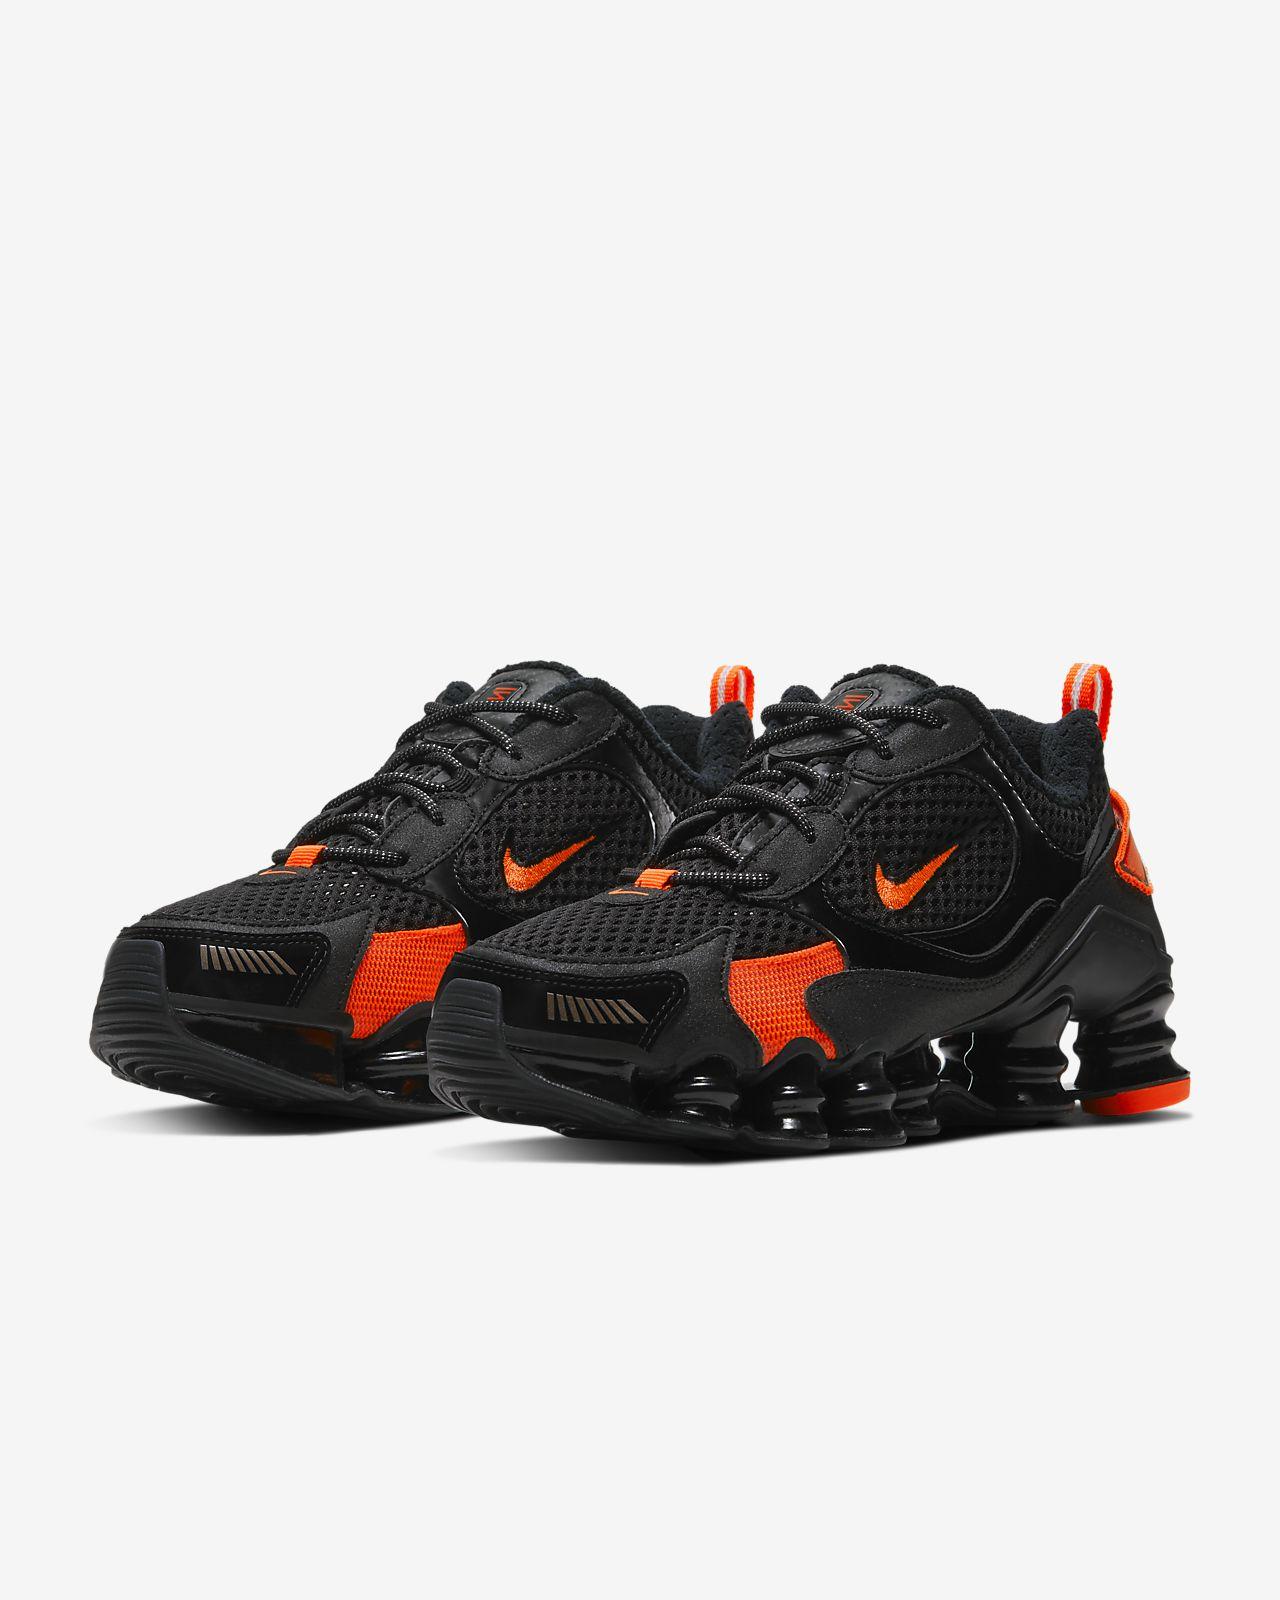 Nike Shox TL Nova SP sko til kvinder